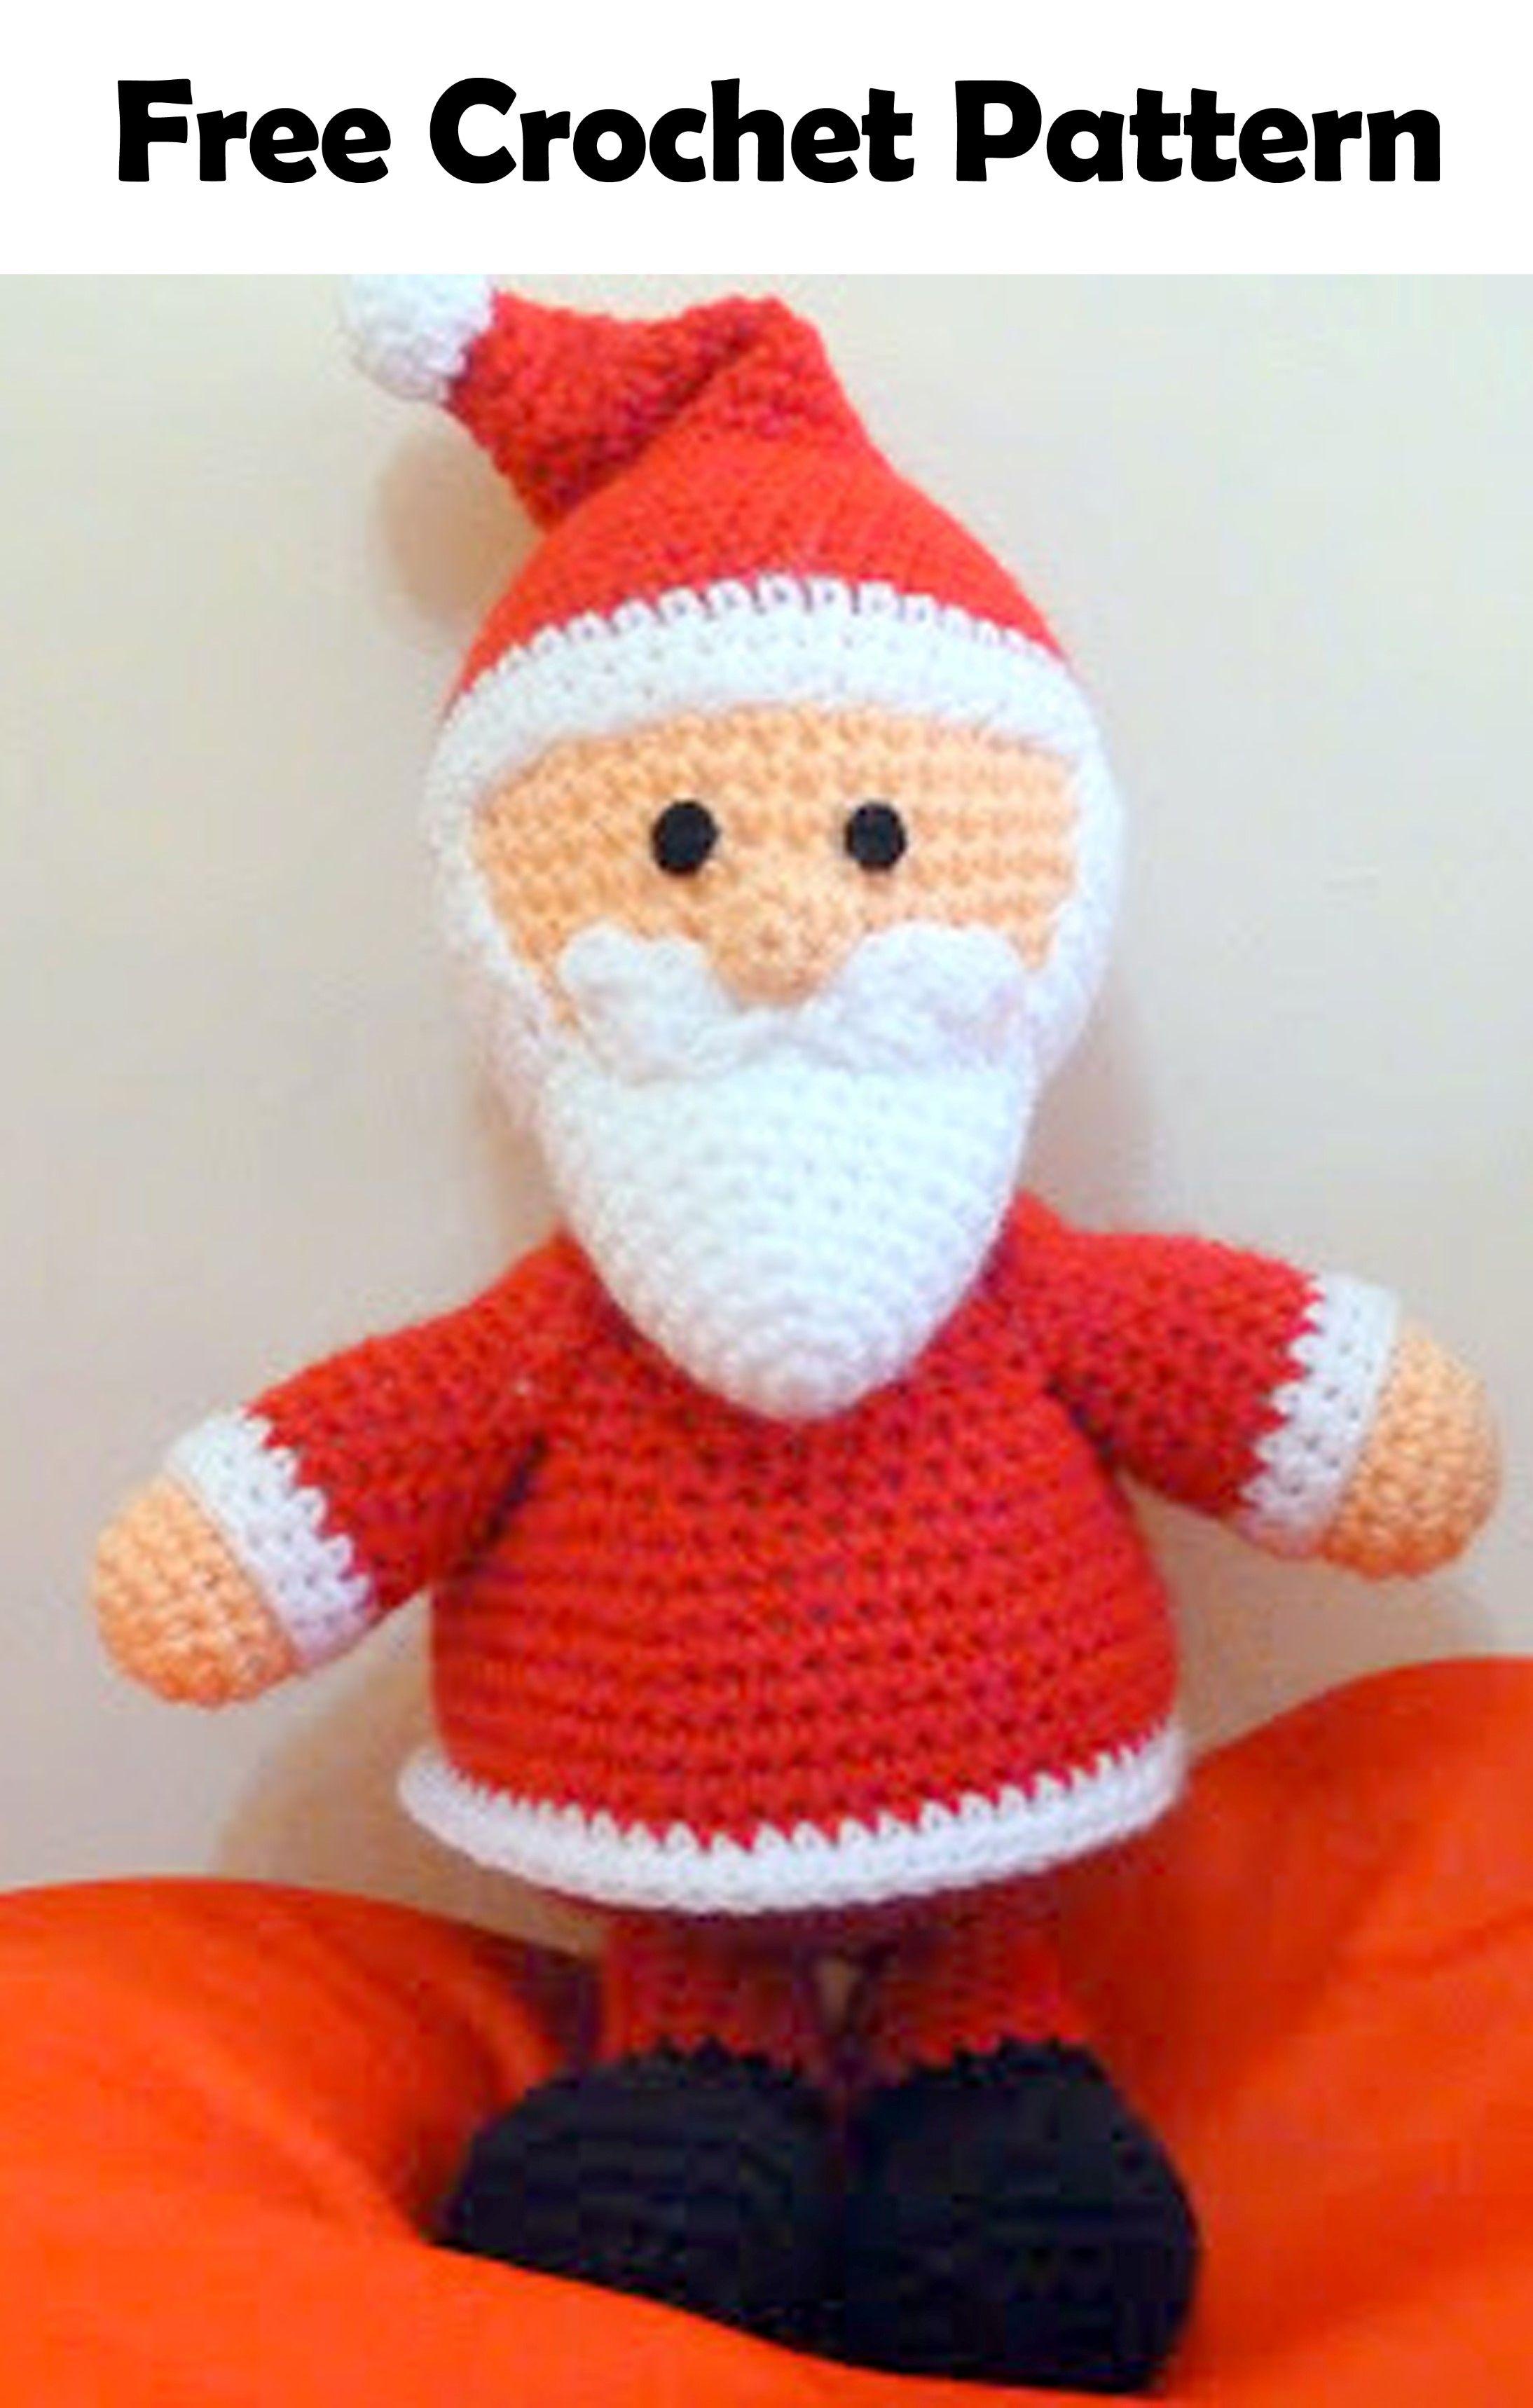 19 Free Amigurumi Christmas Santa Crochet Patterns Amigurumi